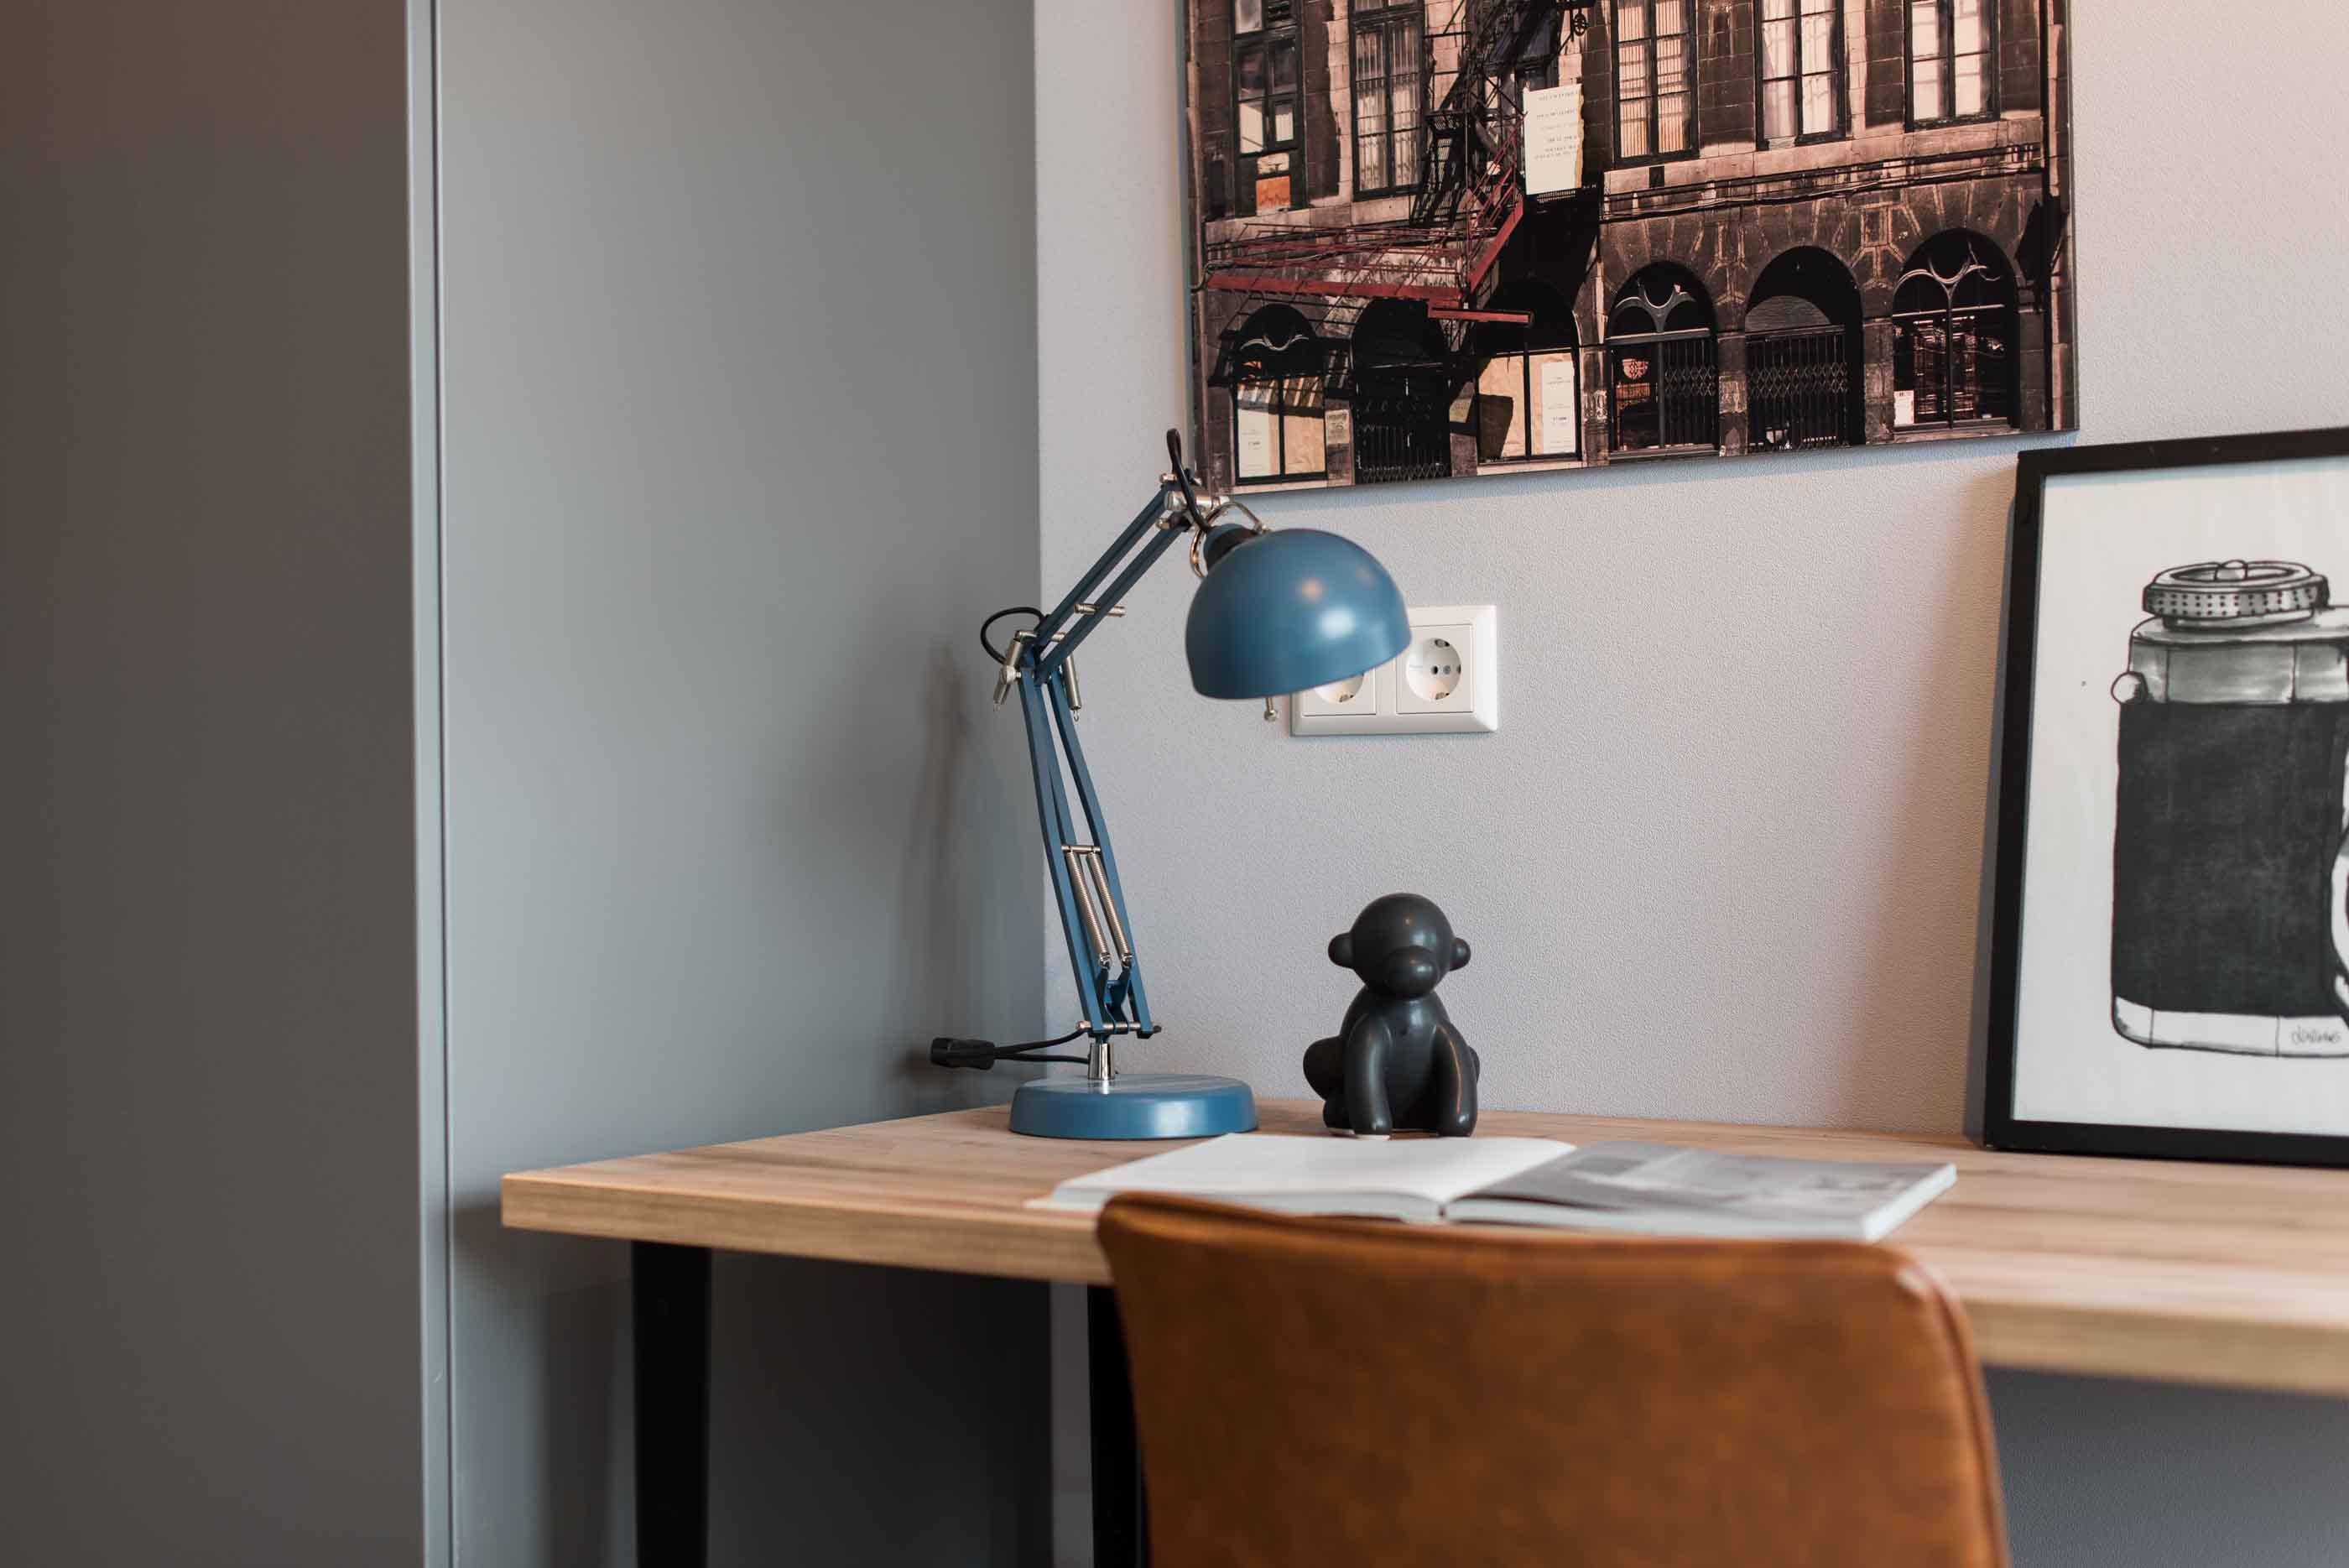 Superior Studio in OurDomain Amsterdam Diemen - detail of the desk